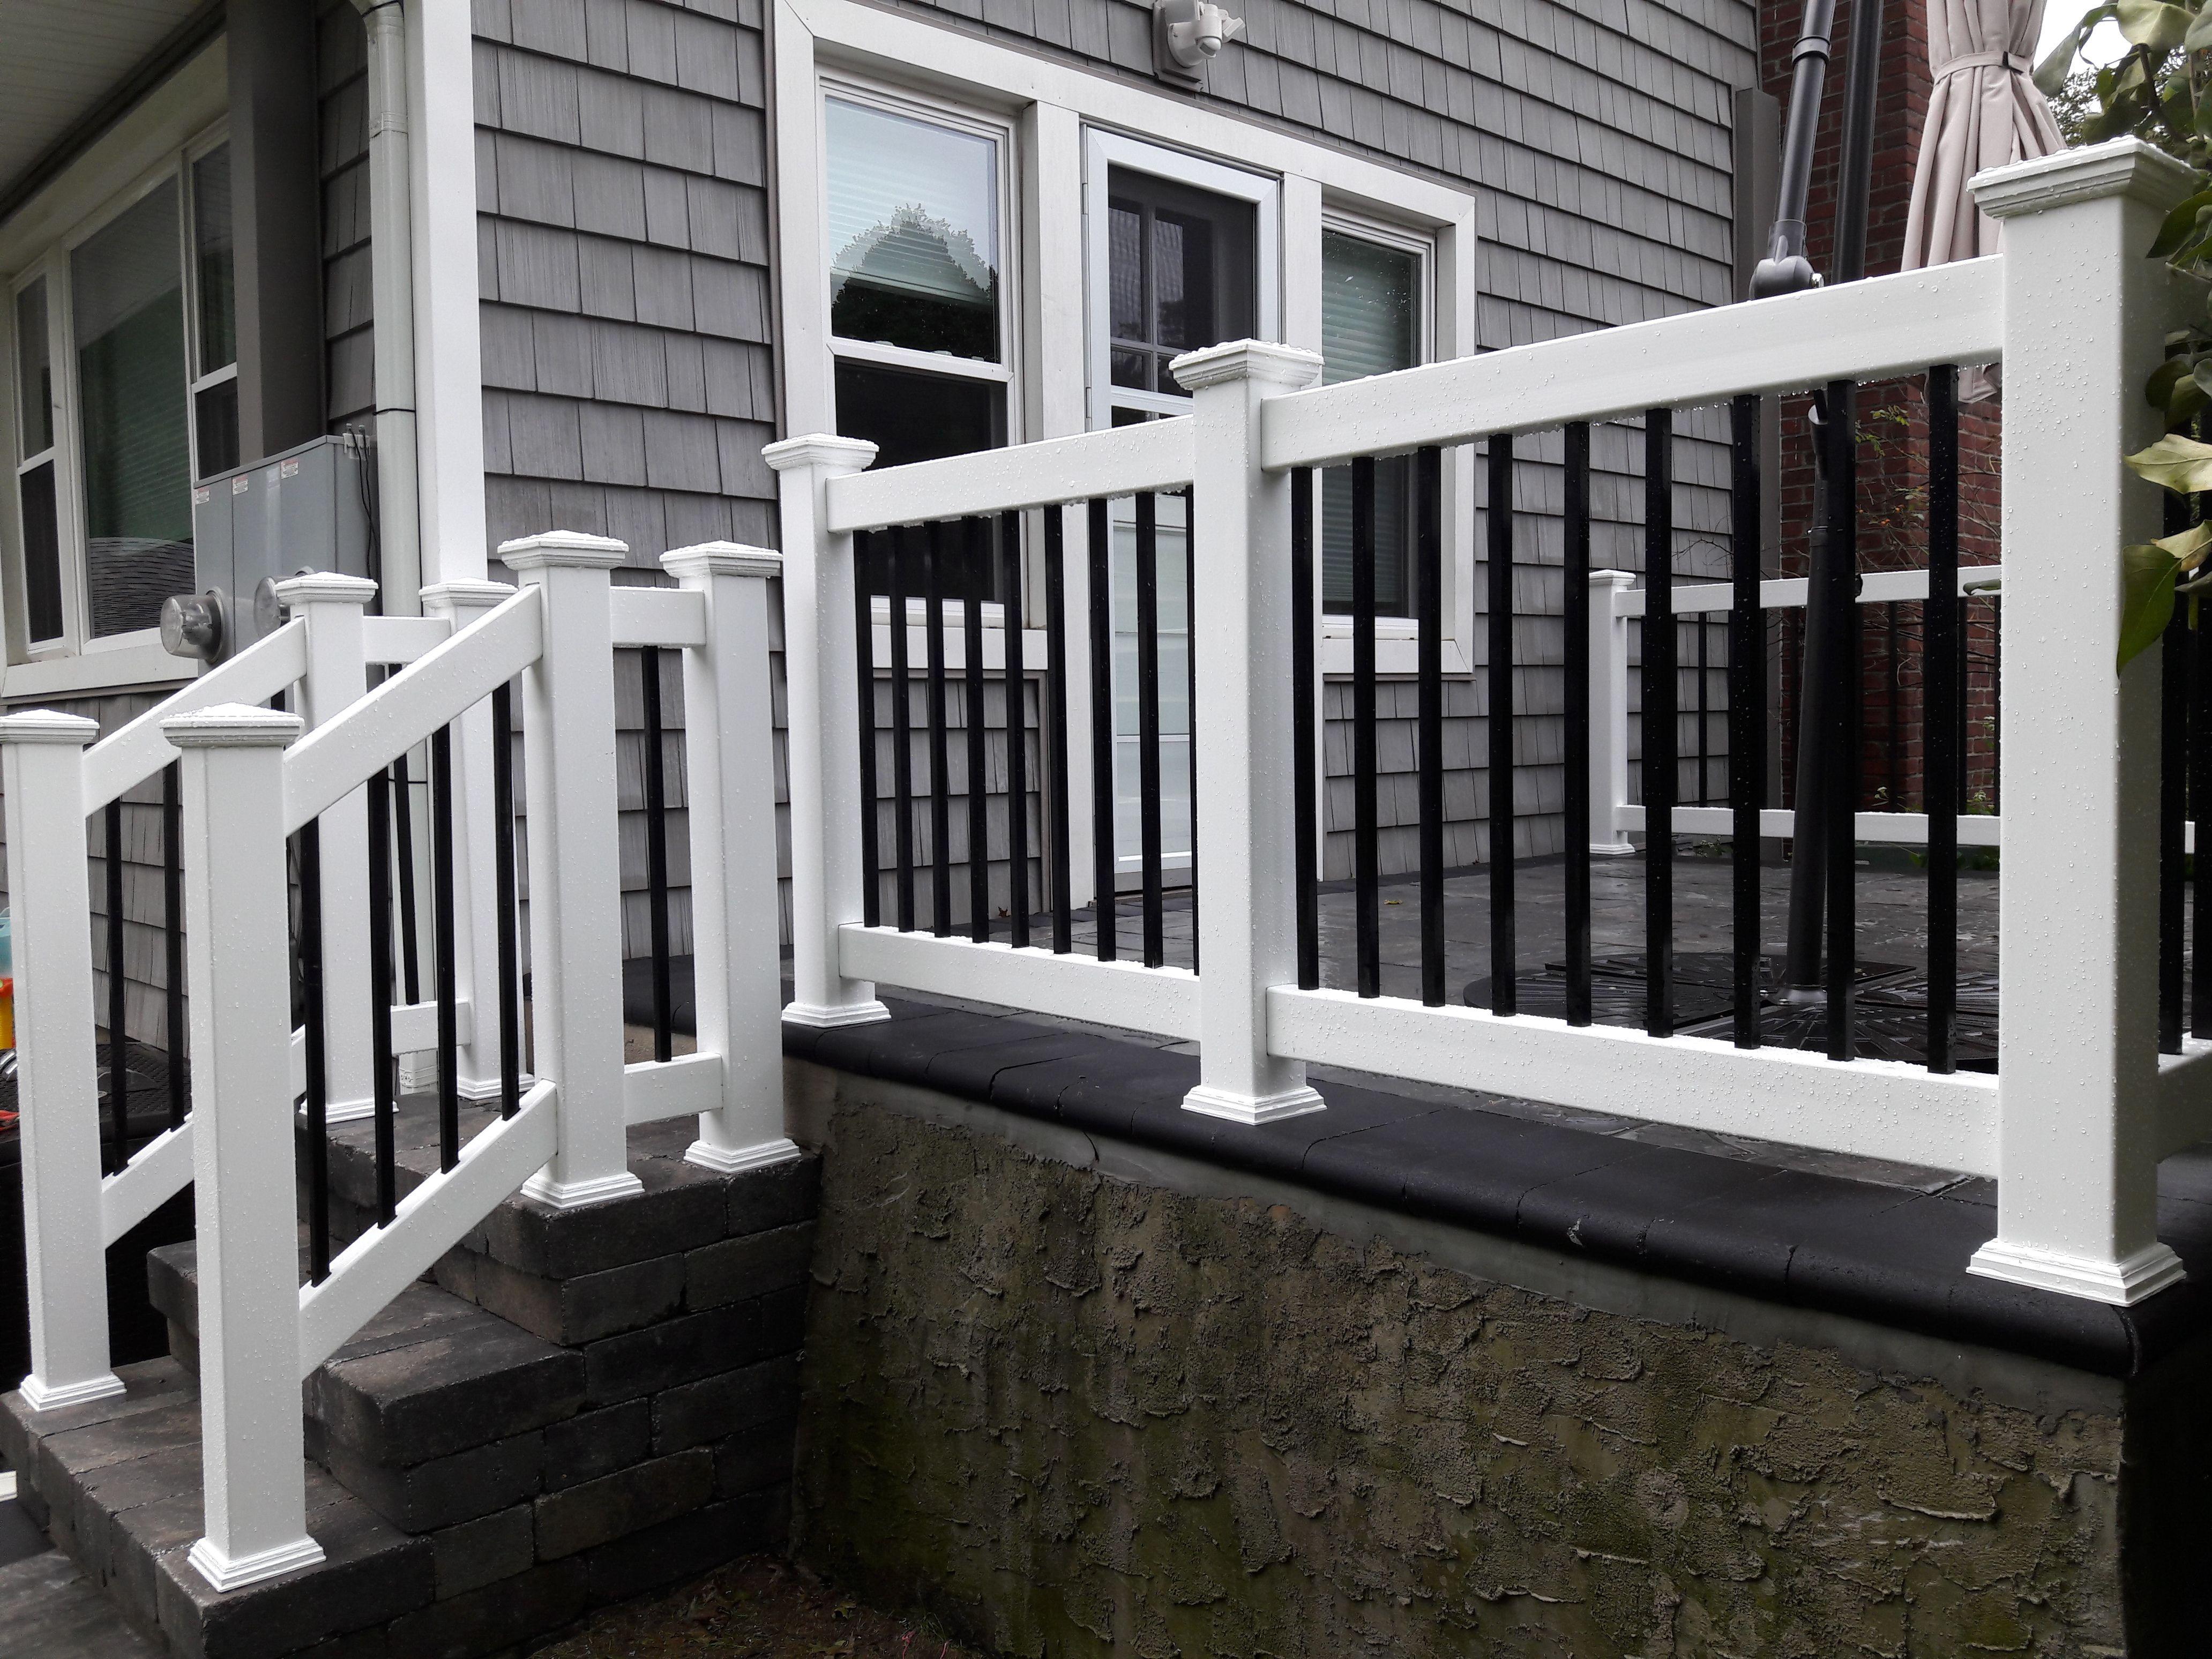 3 White Pvc Vinyl Black Aluminum Deck Rails Gates And Railings Aluminum Railing Deck Deck Railings